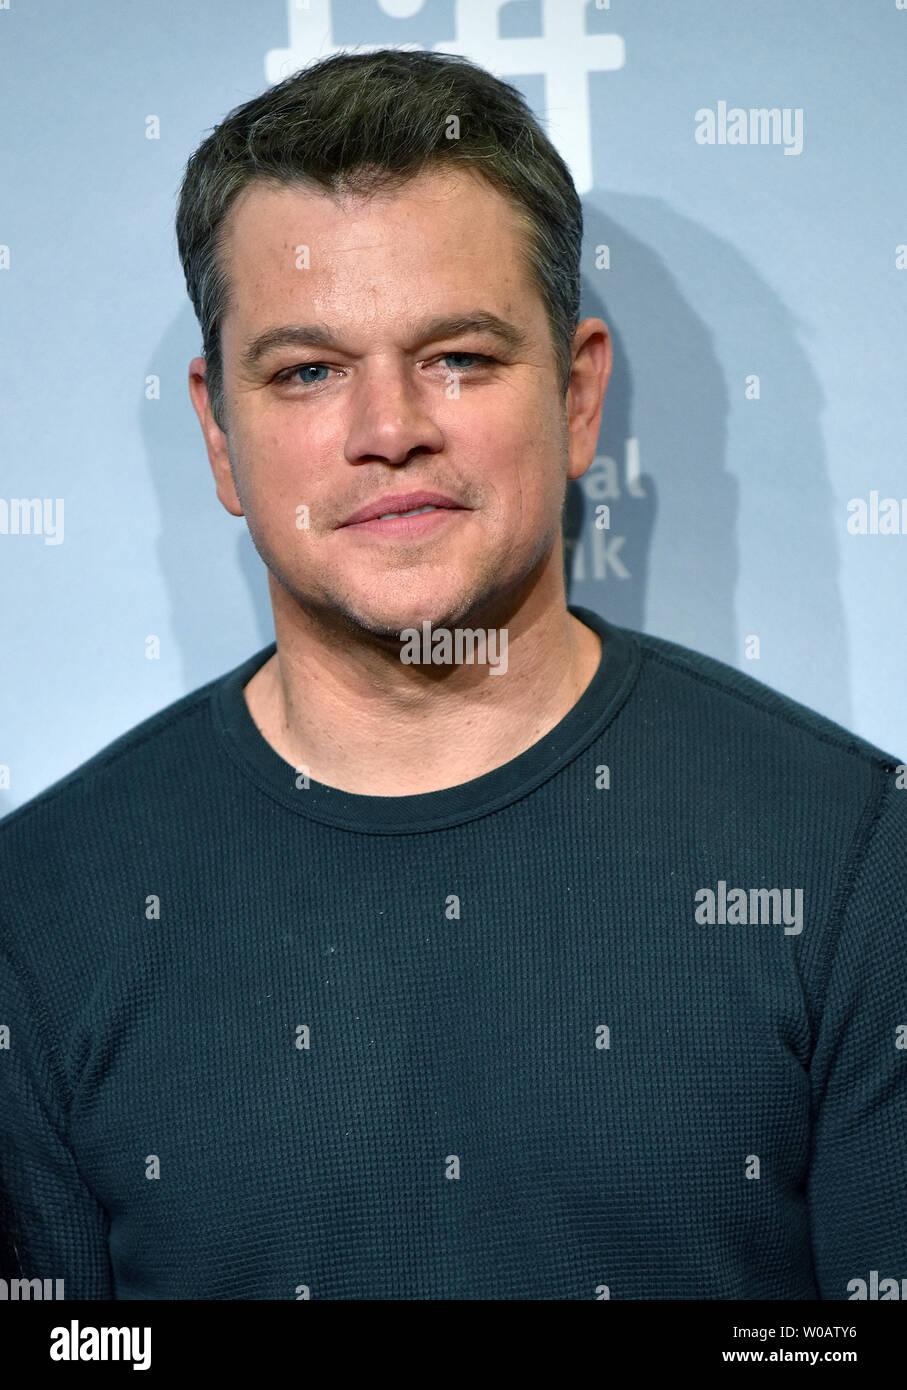 Matt Damon attends the Toronto International Film Festival photocall for 'Downsizing' at TIFF Bell Lightbox in Toronto, Canada on September 10, 2017. Photo by Christine Chew/UPI - Stock Image